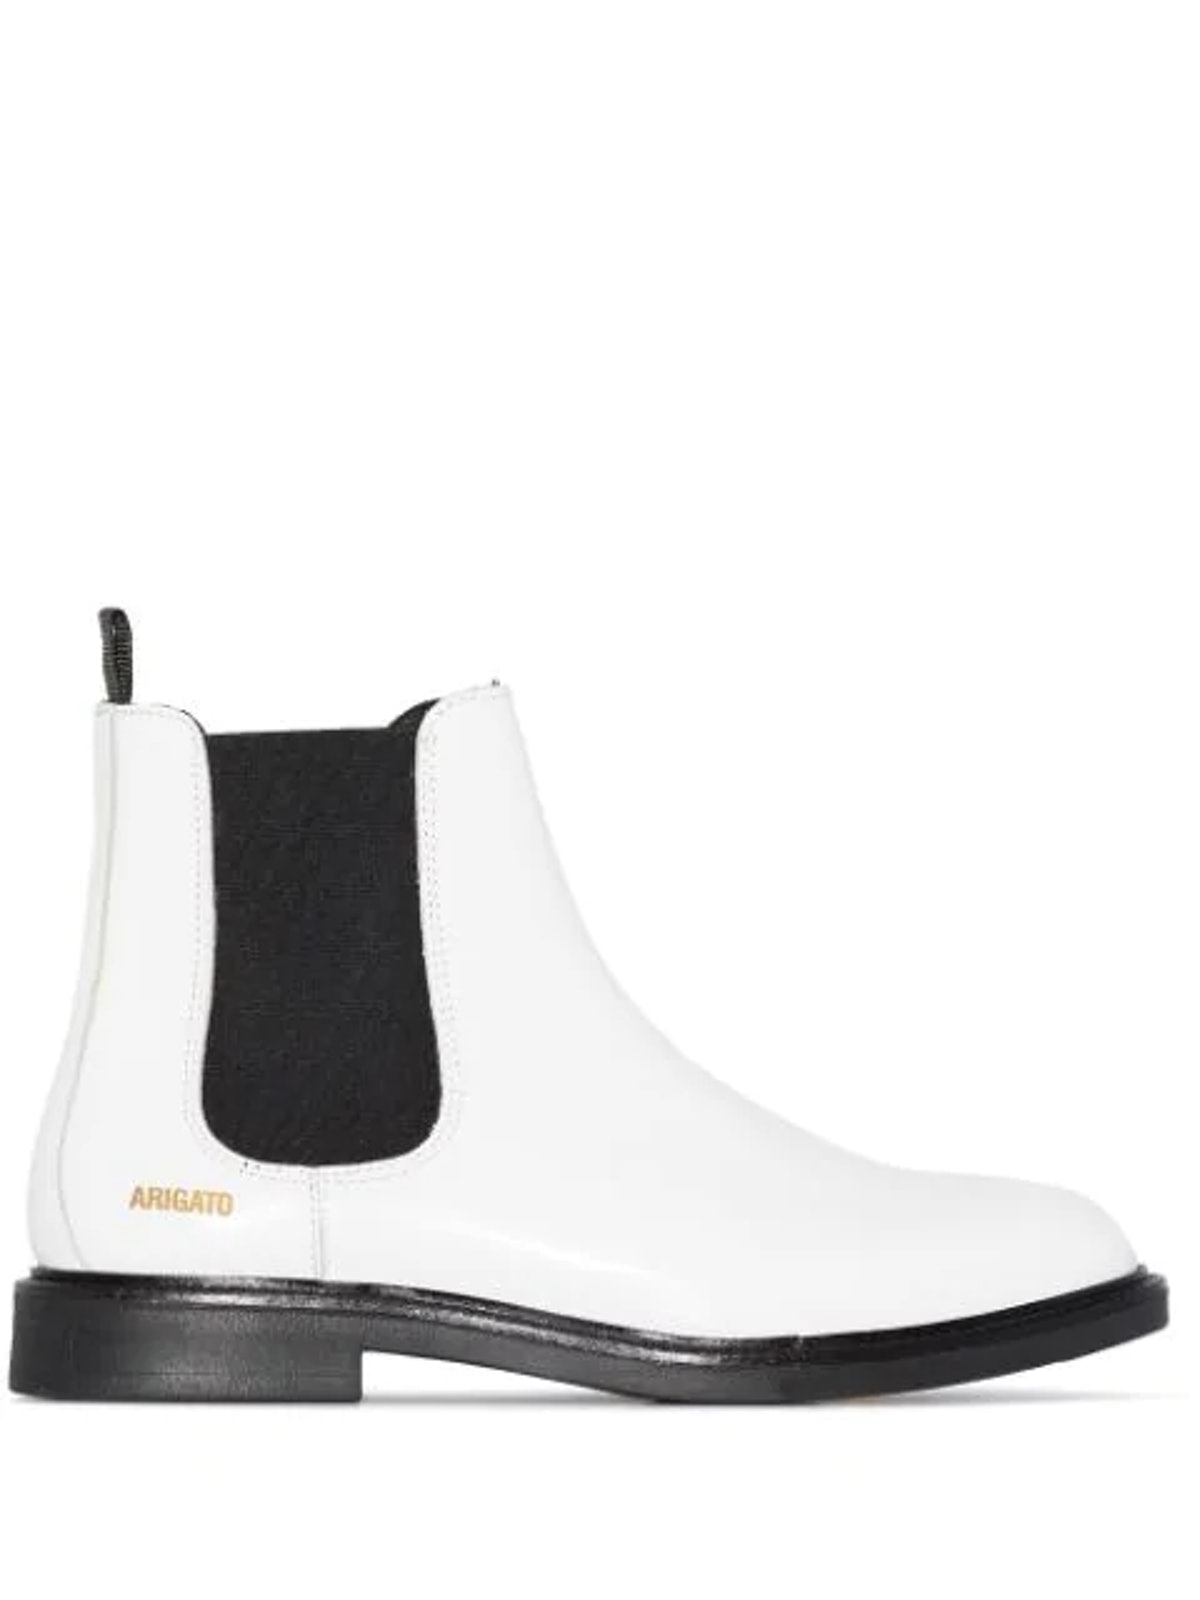 Axel Arigato logo-detail Chelsea boots